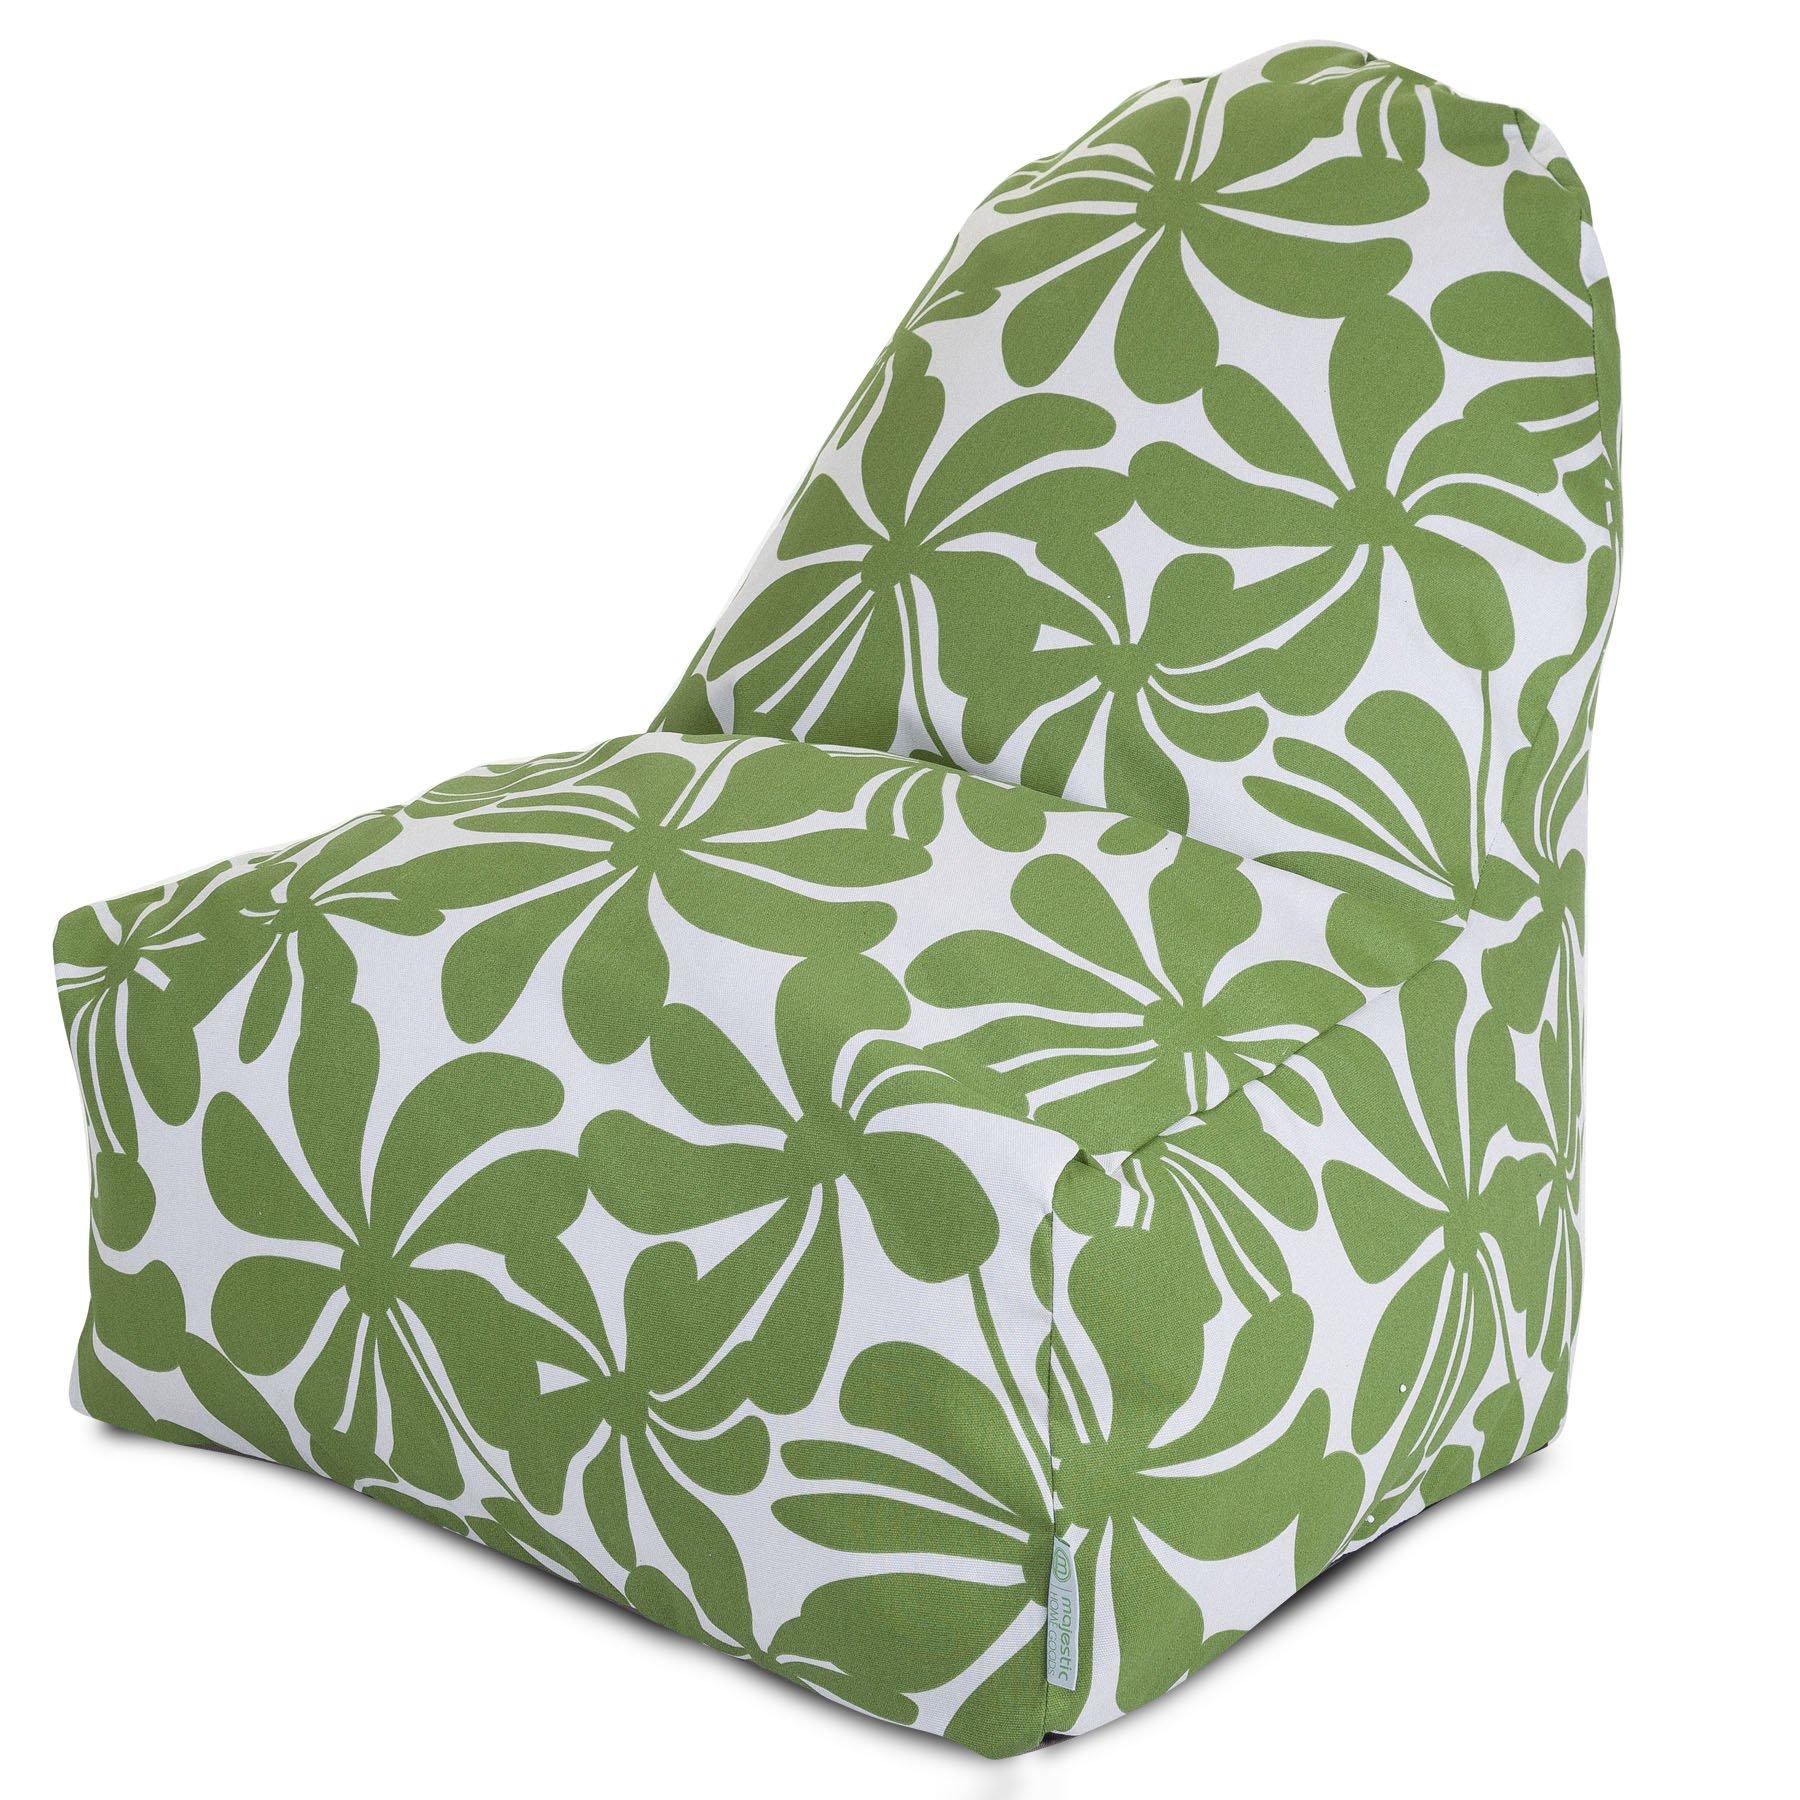 Majestic Home Goods Kick-It Chair, Plantation, Sage